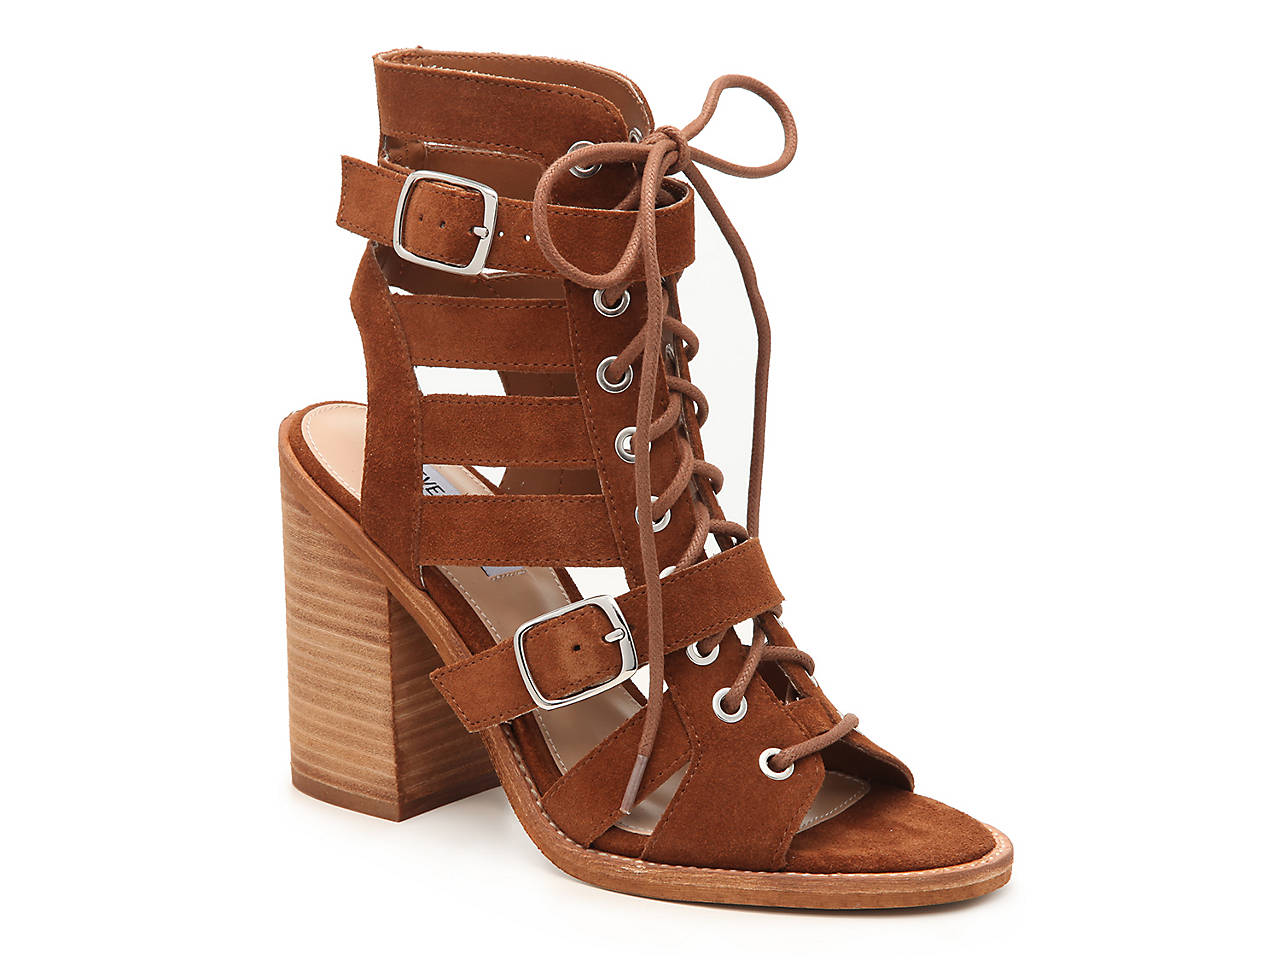 6bba7bf8808 Steve Madden Cecilia Sandal Women s Shoes